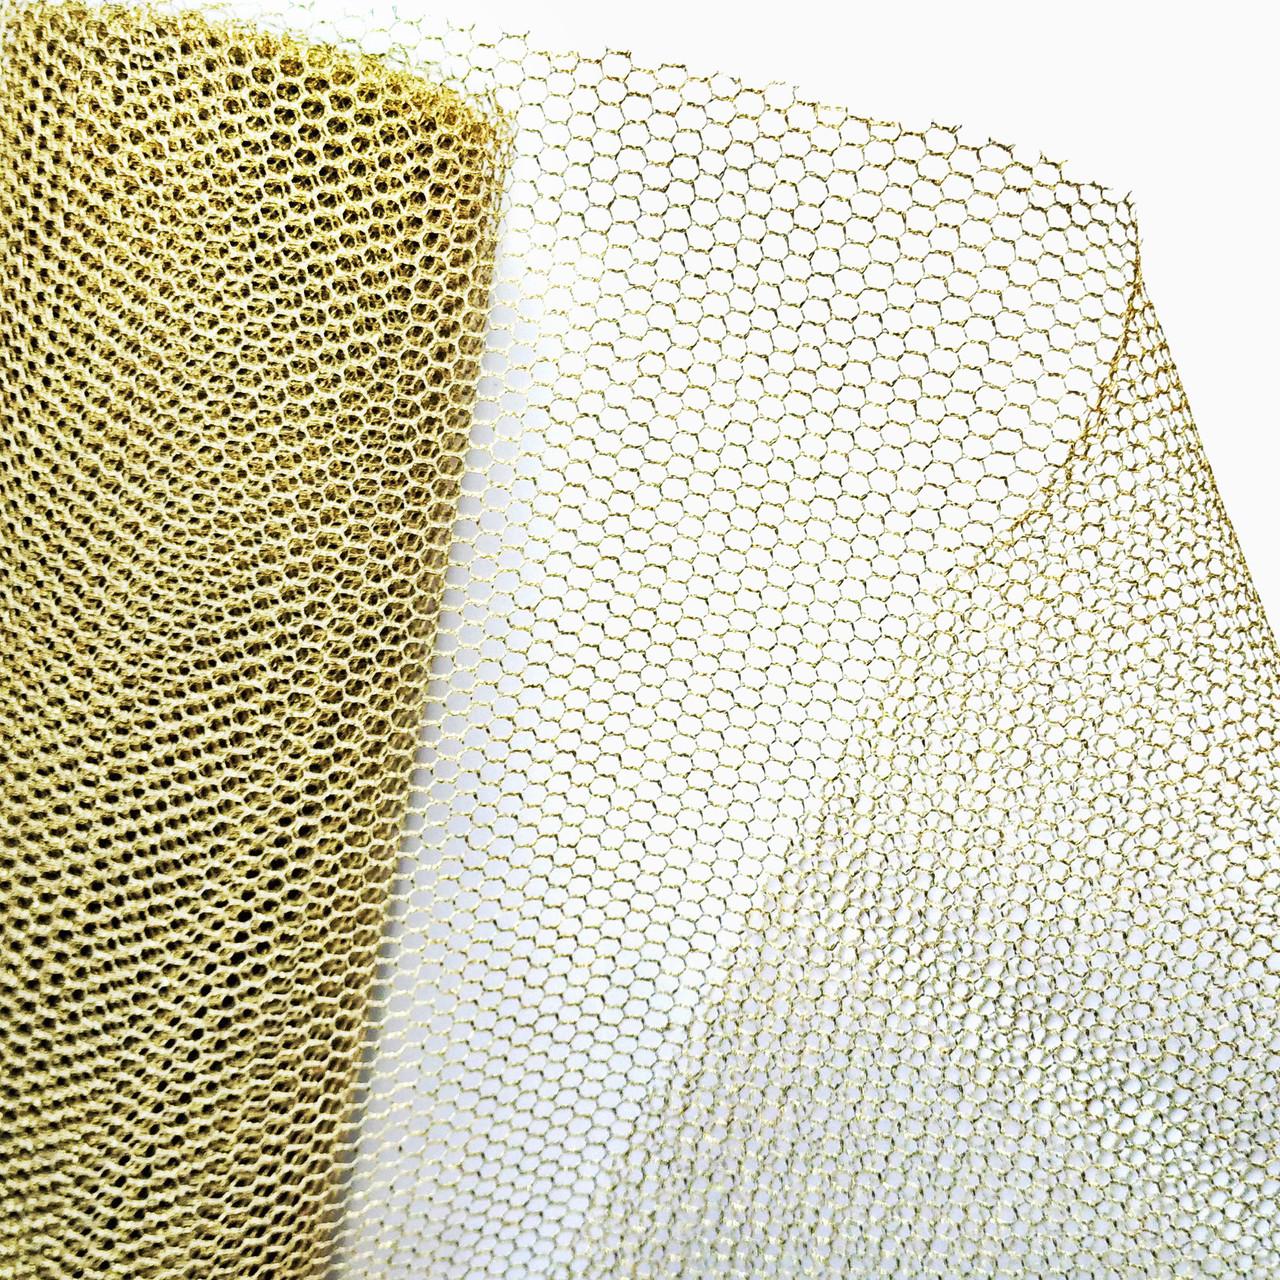 Сетка  Metall glitter светлое золото 86 см х 9 ярдов